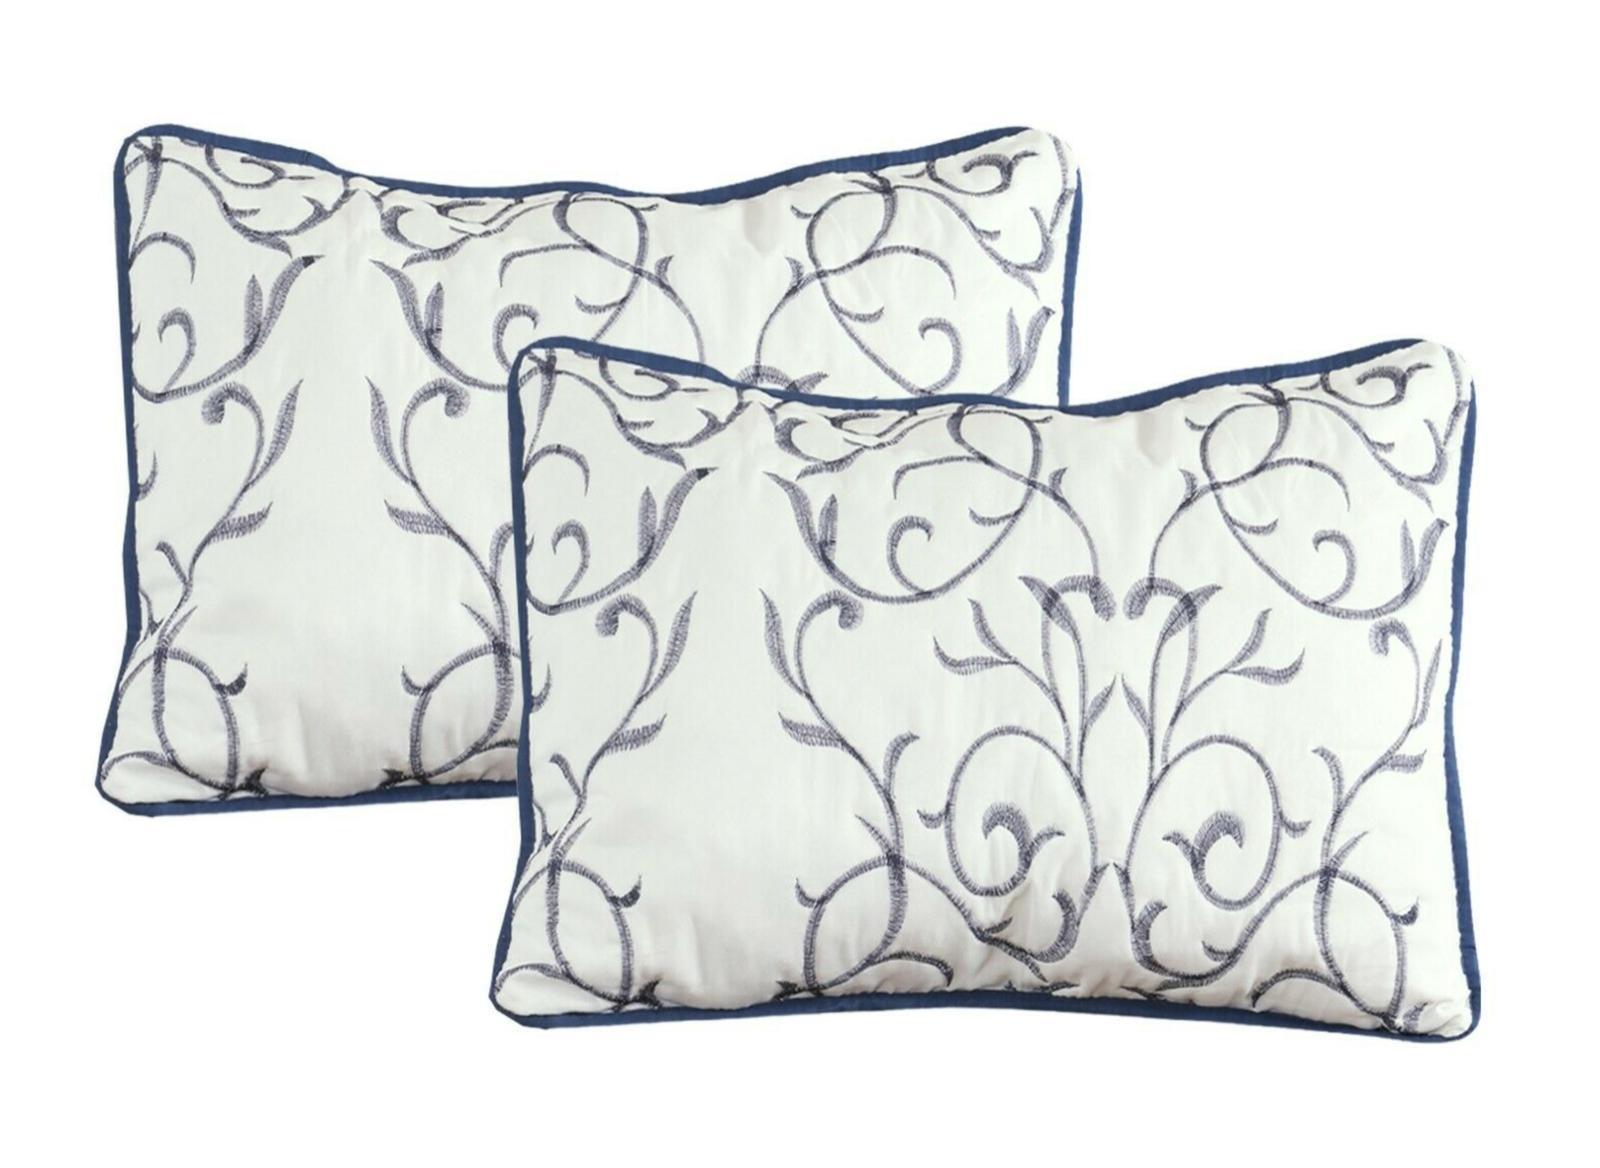 Embroidered Cotton Blend Reversible Bedding Set Modern